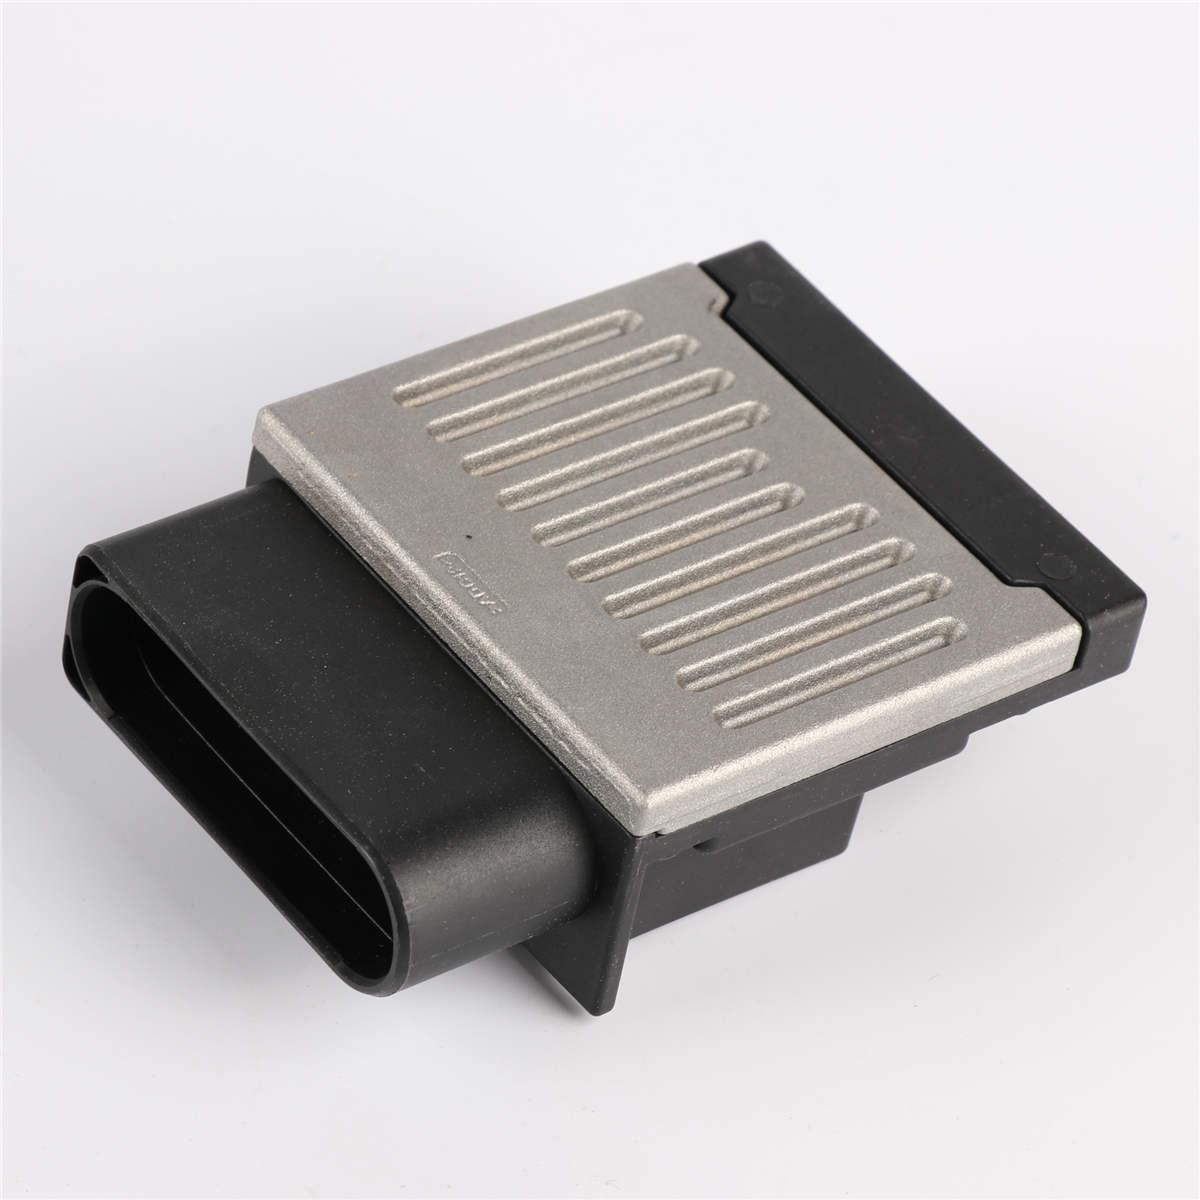 1pcs oem fuel pump control m dulo for vw passat b8 golf tou 1 en mercado libre. Black Bedroom Furniture Sets. Home Design Ideas